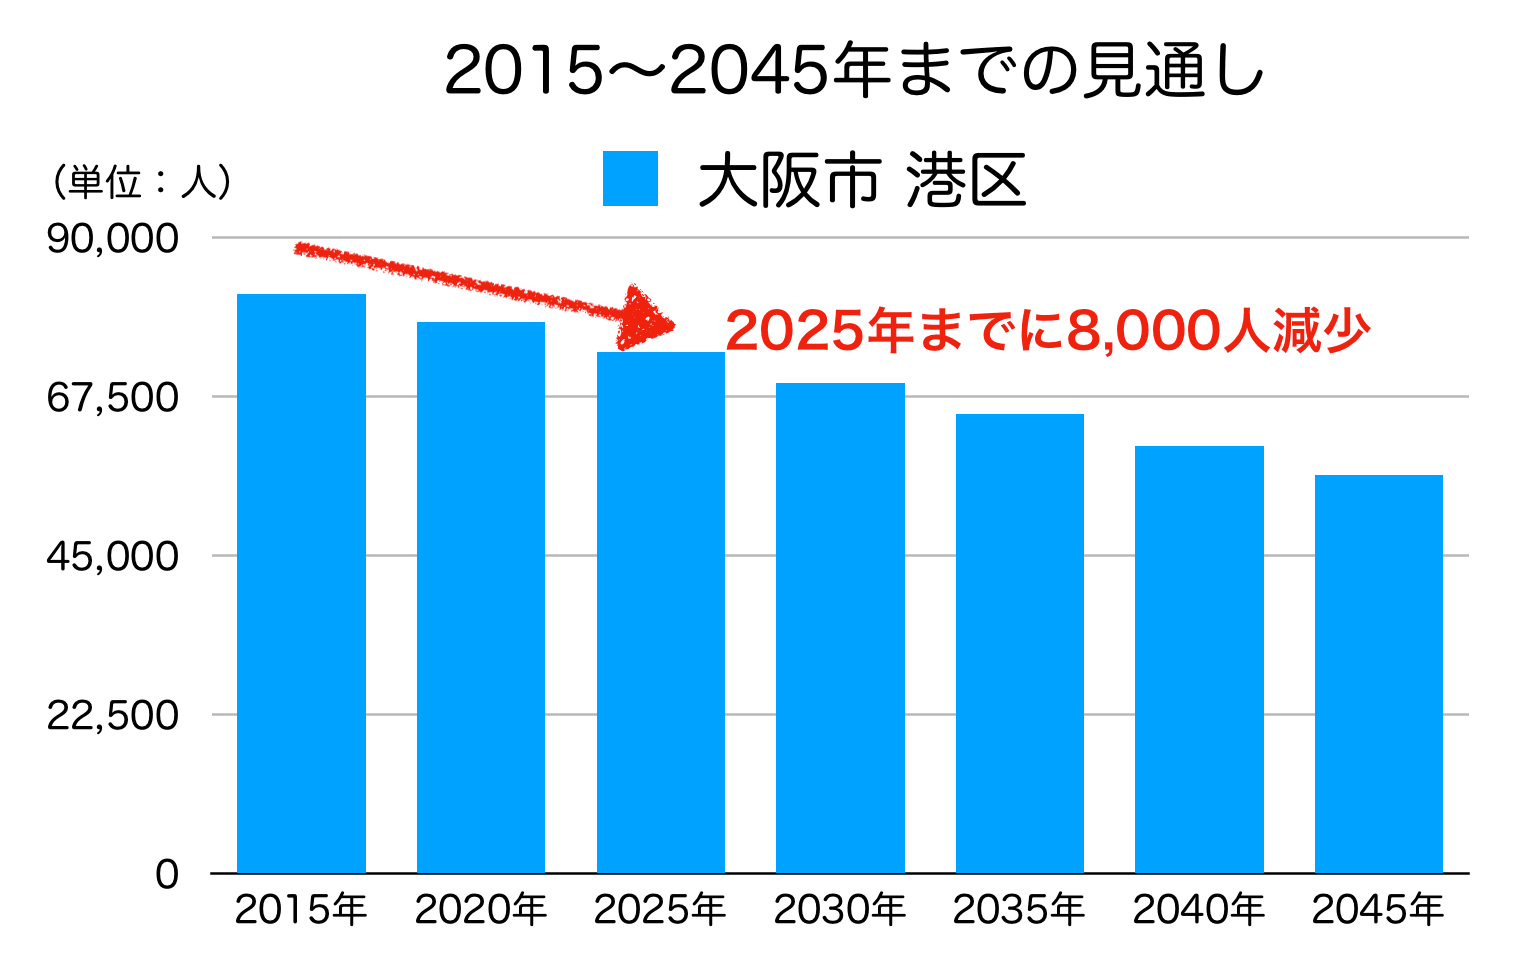 大阪市港区の人口予測